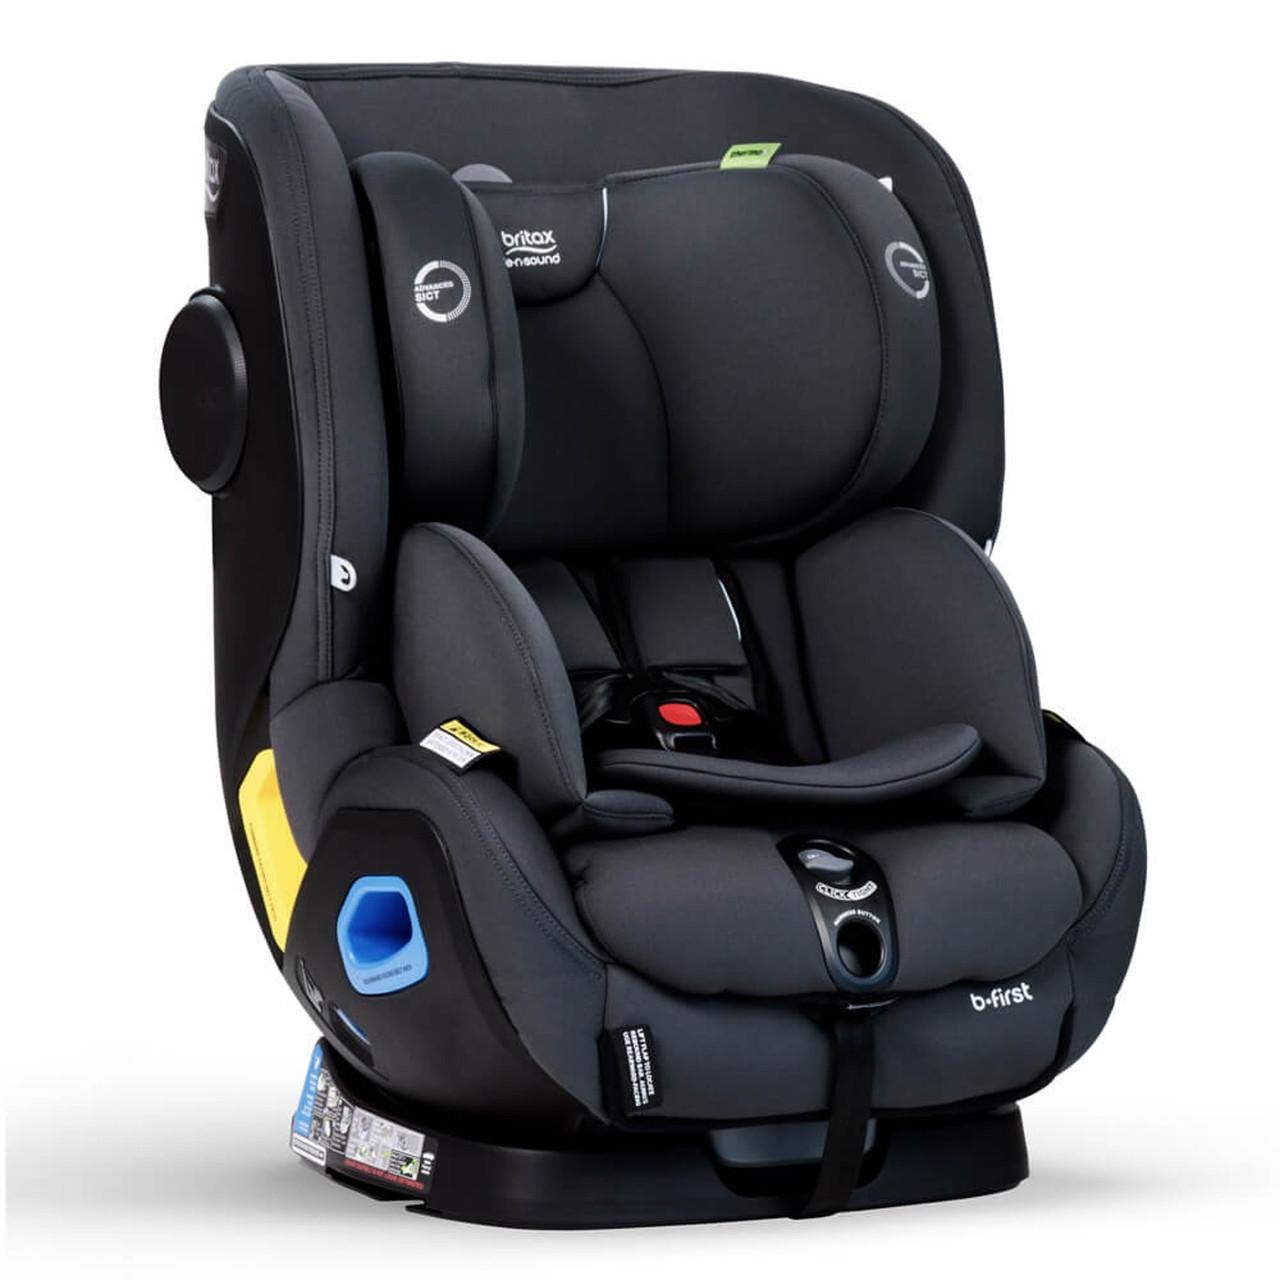 Britax Safe n Sound B-First Car Seat  - CHARCOAL